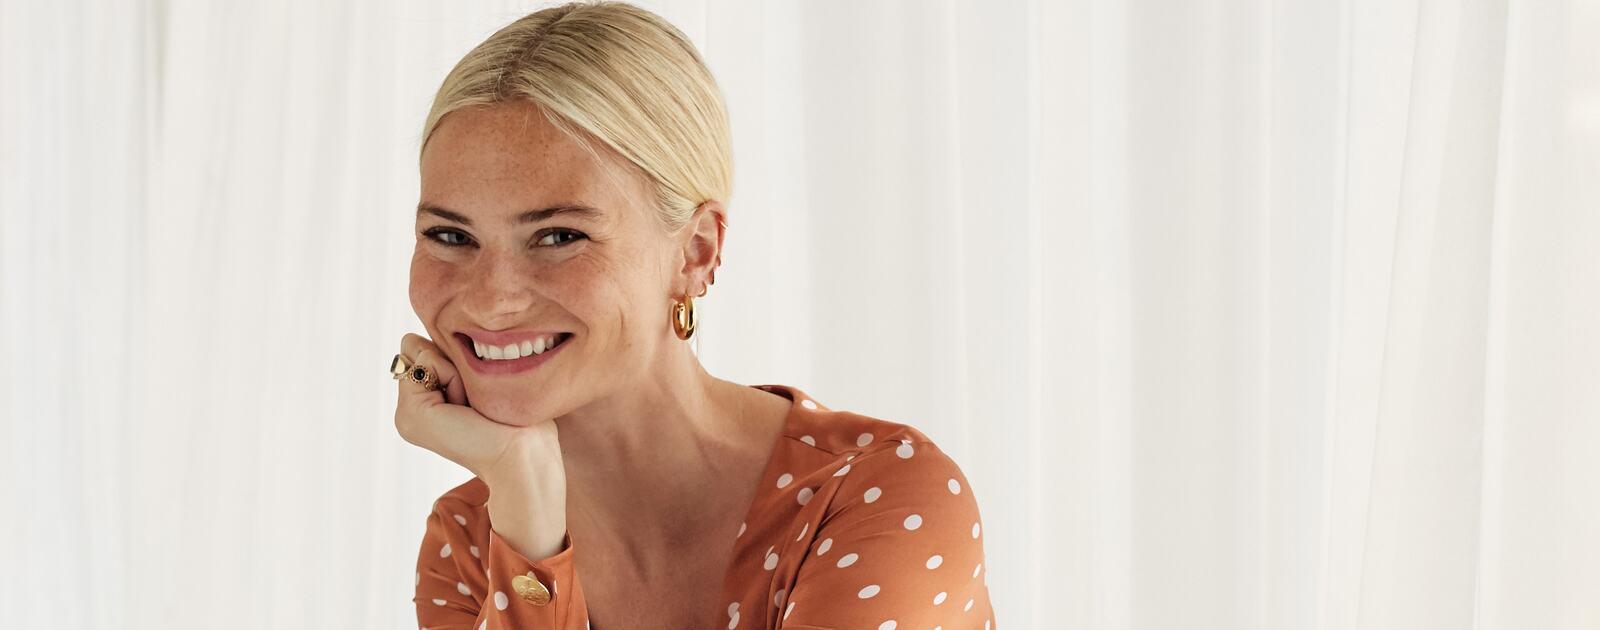 Pandora Sykes, writer